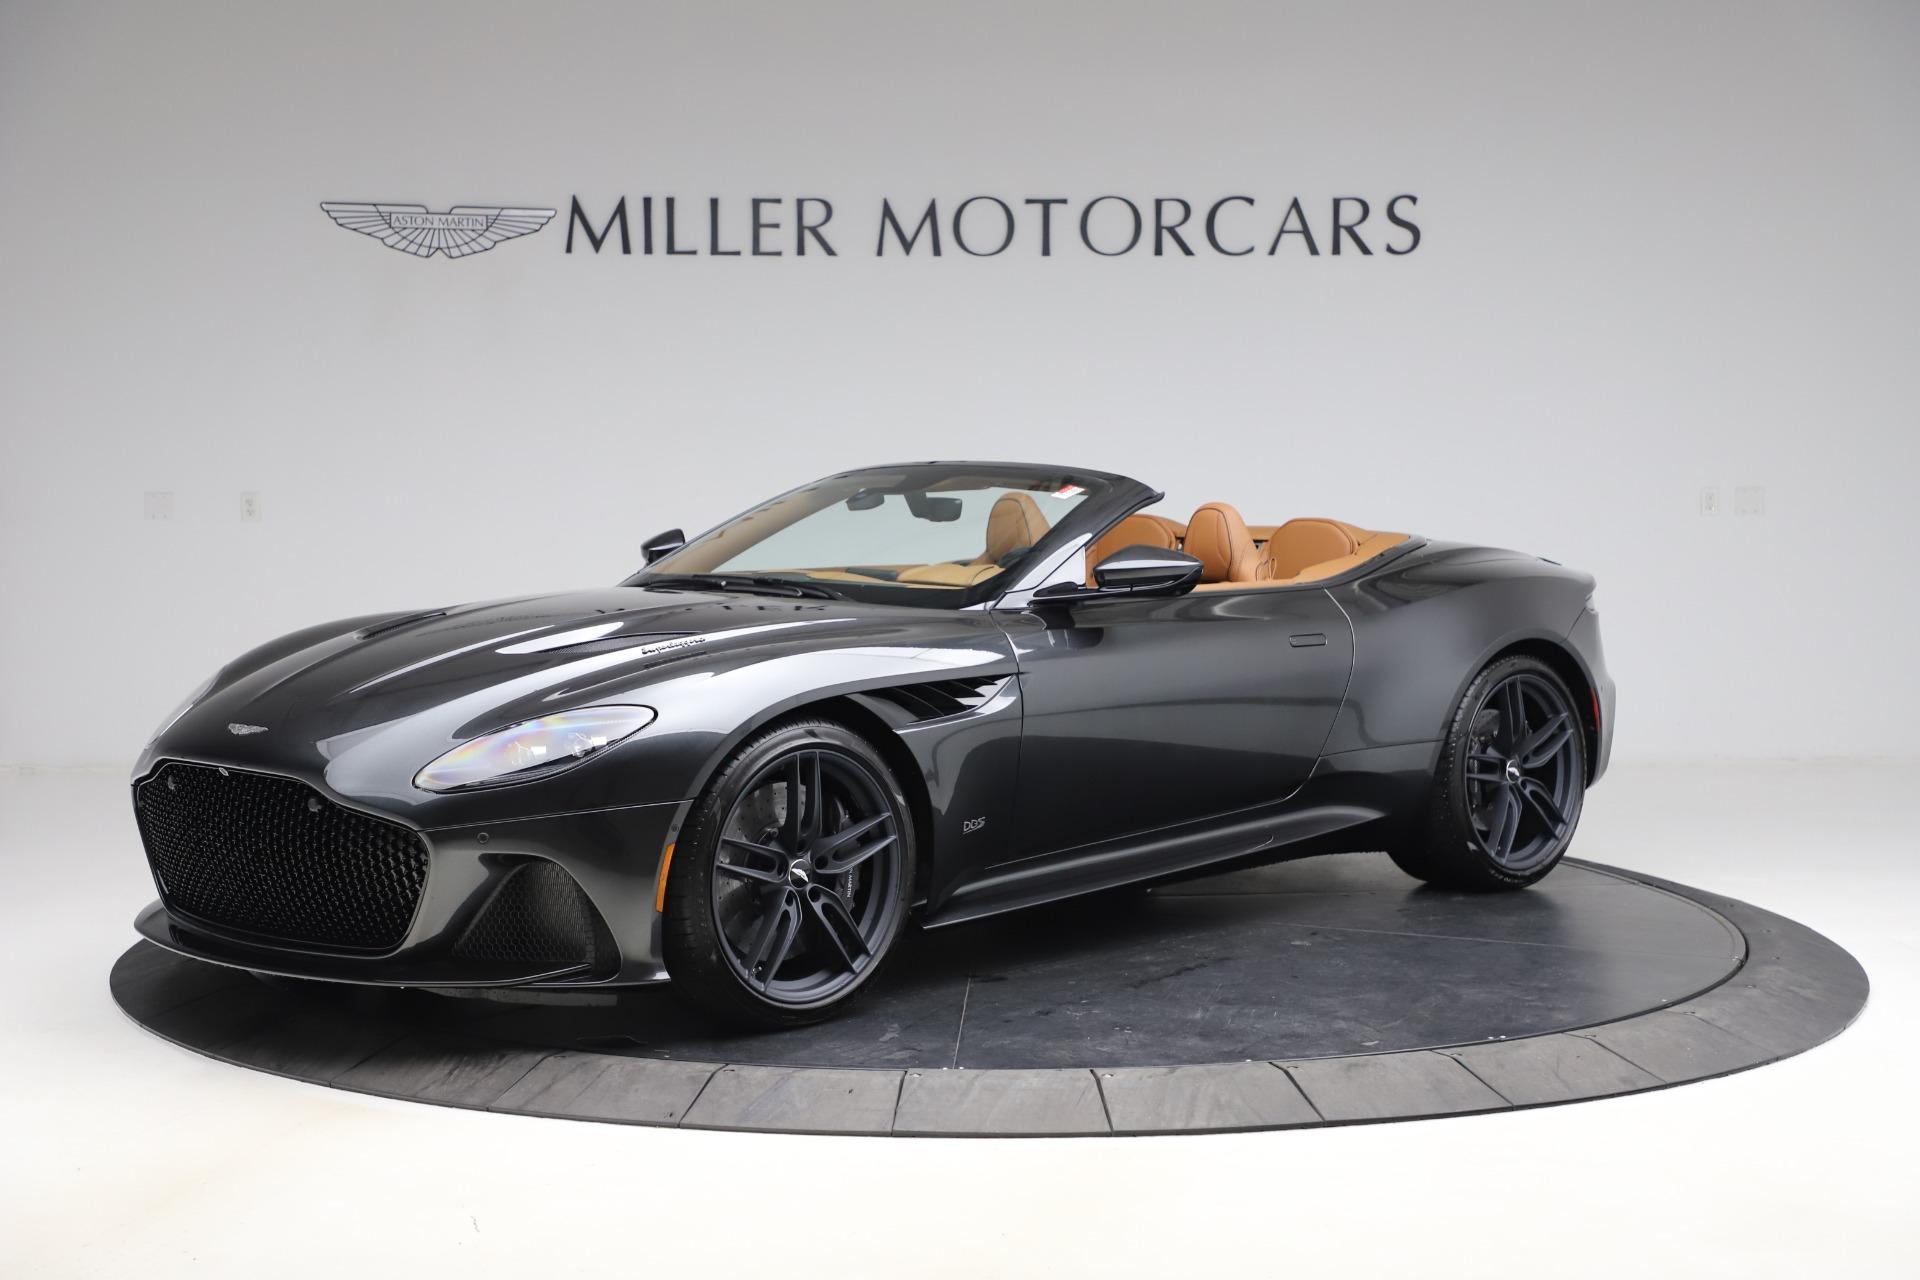 New 2021 Aston Martin DBS Superleggera Volante Convertible for sale $402,786 at Rolls-Royce Motor Cars Greenwich in Greenwich CT 06830 1